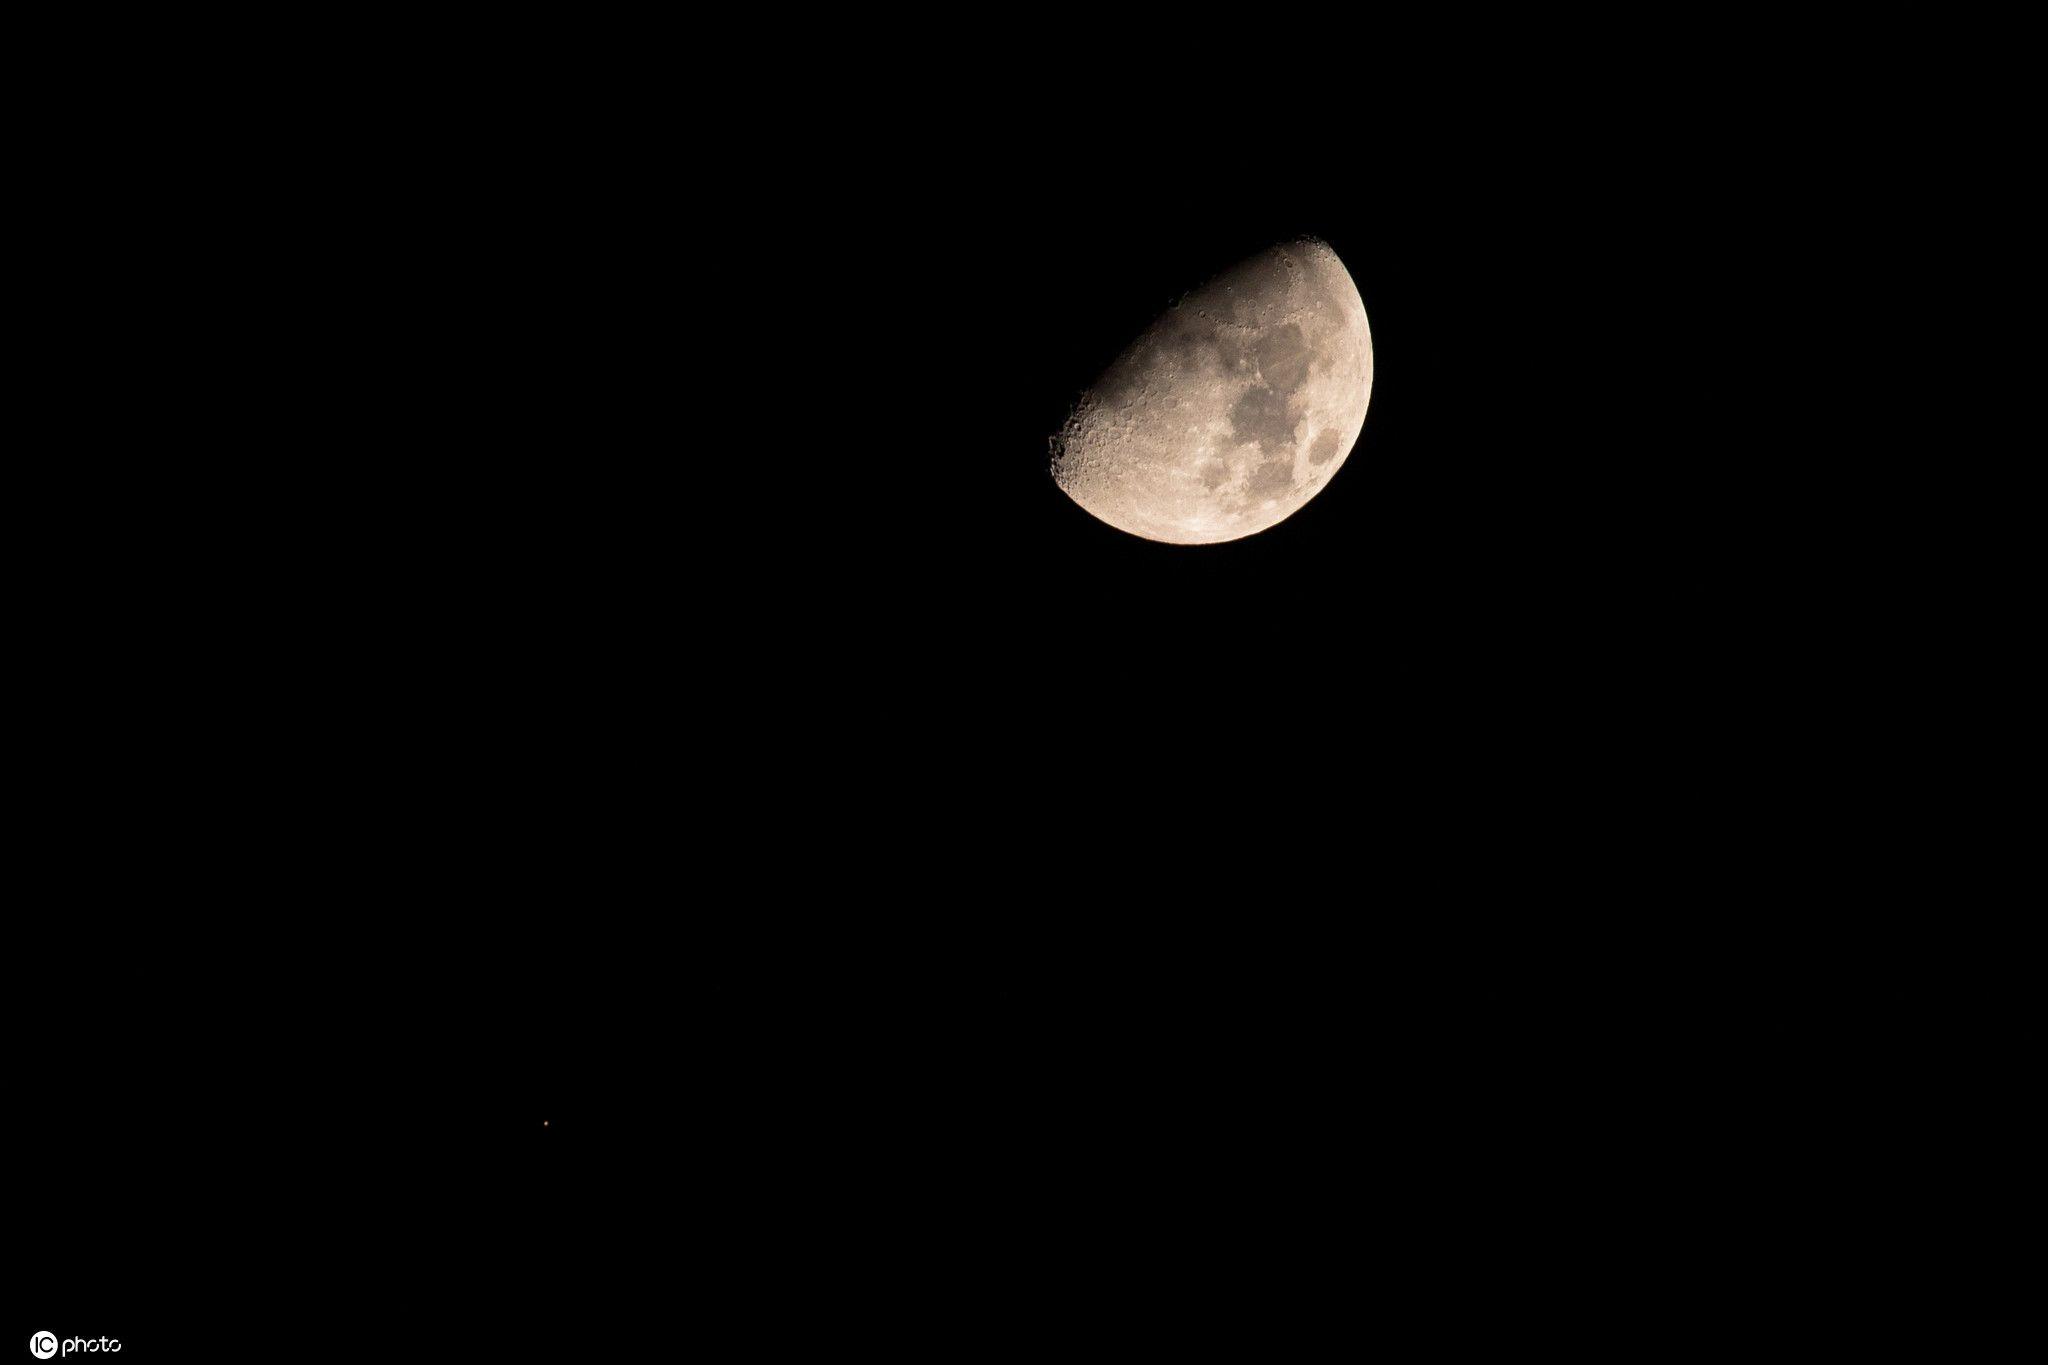 期待!2021火星合月!